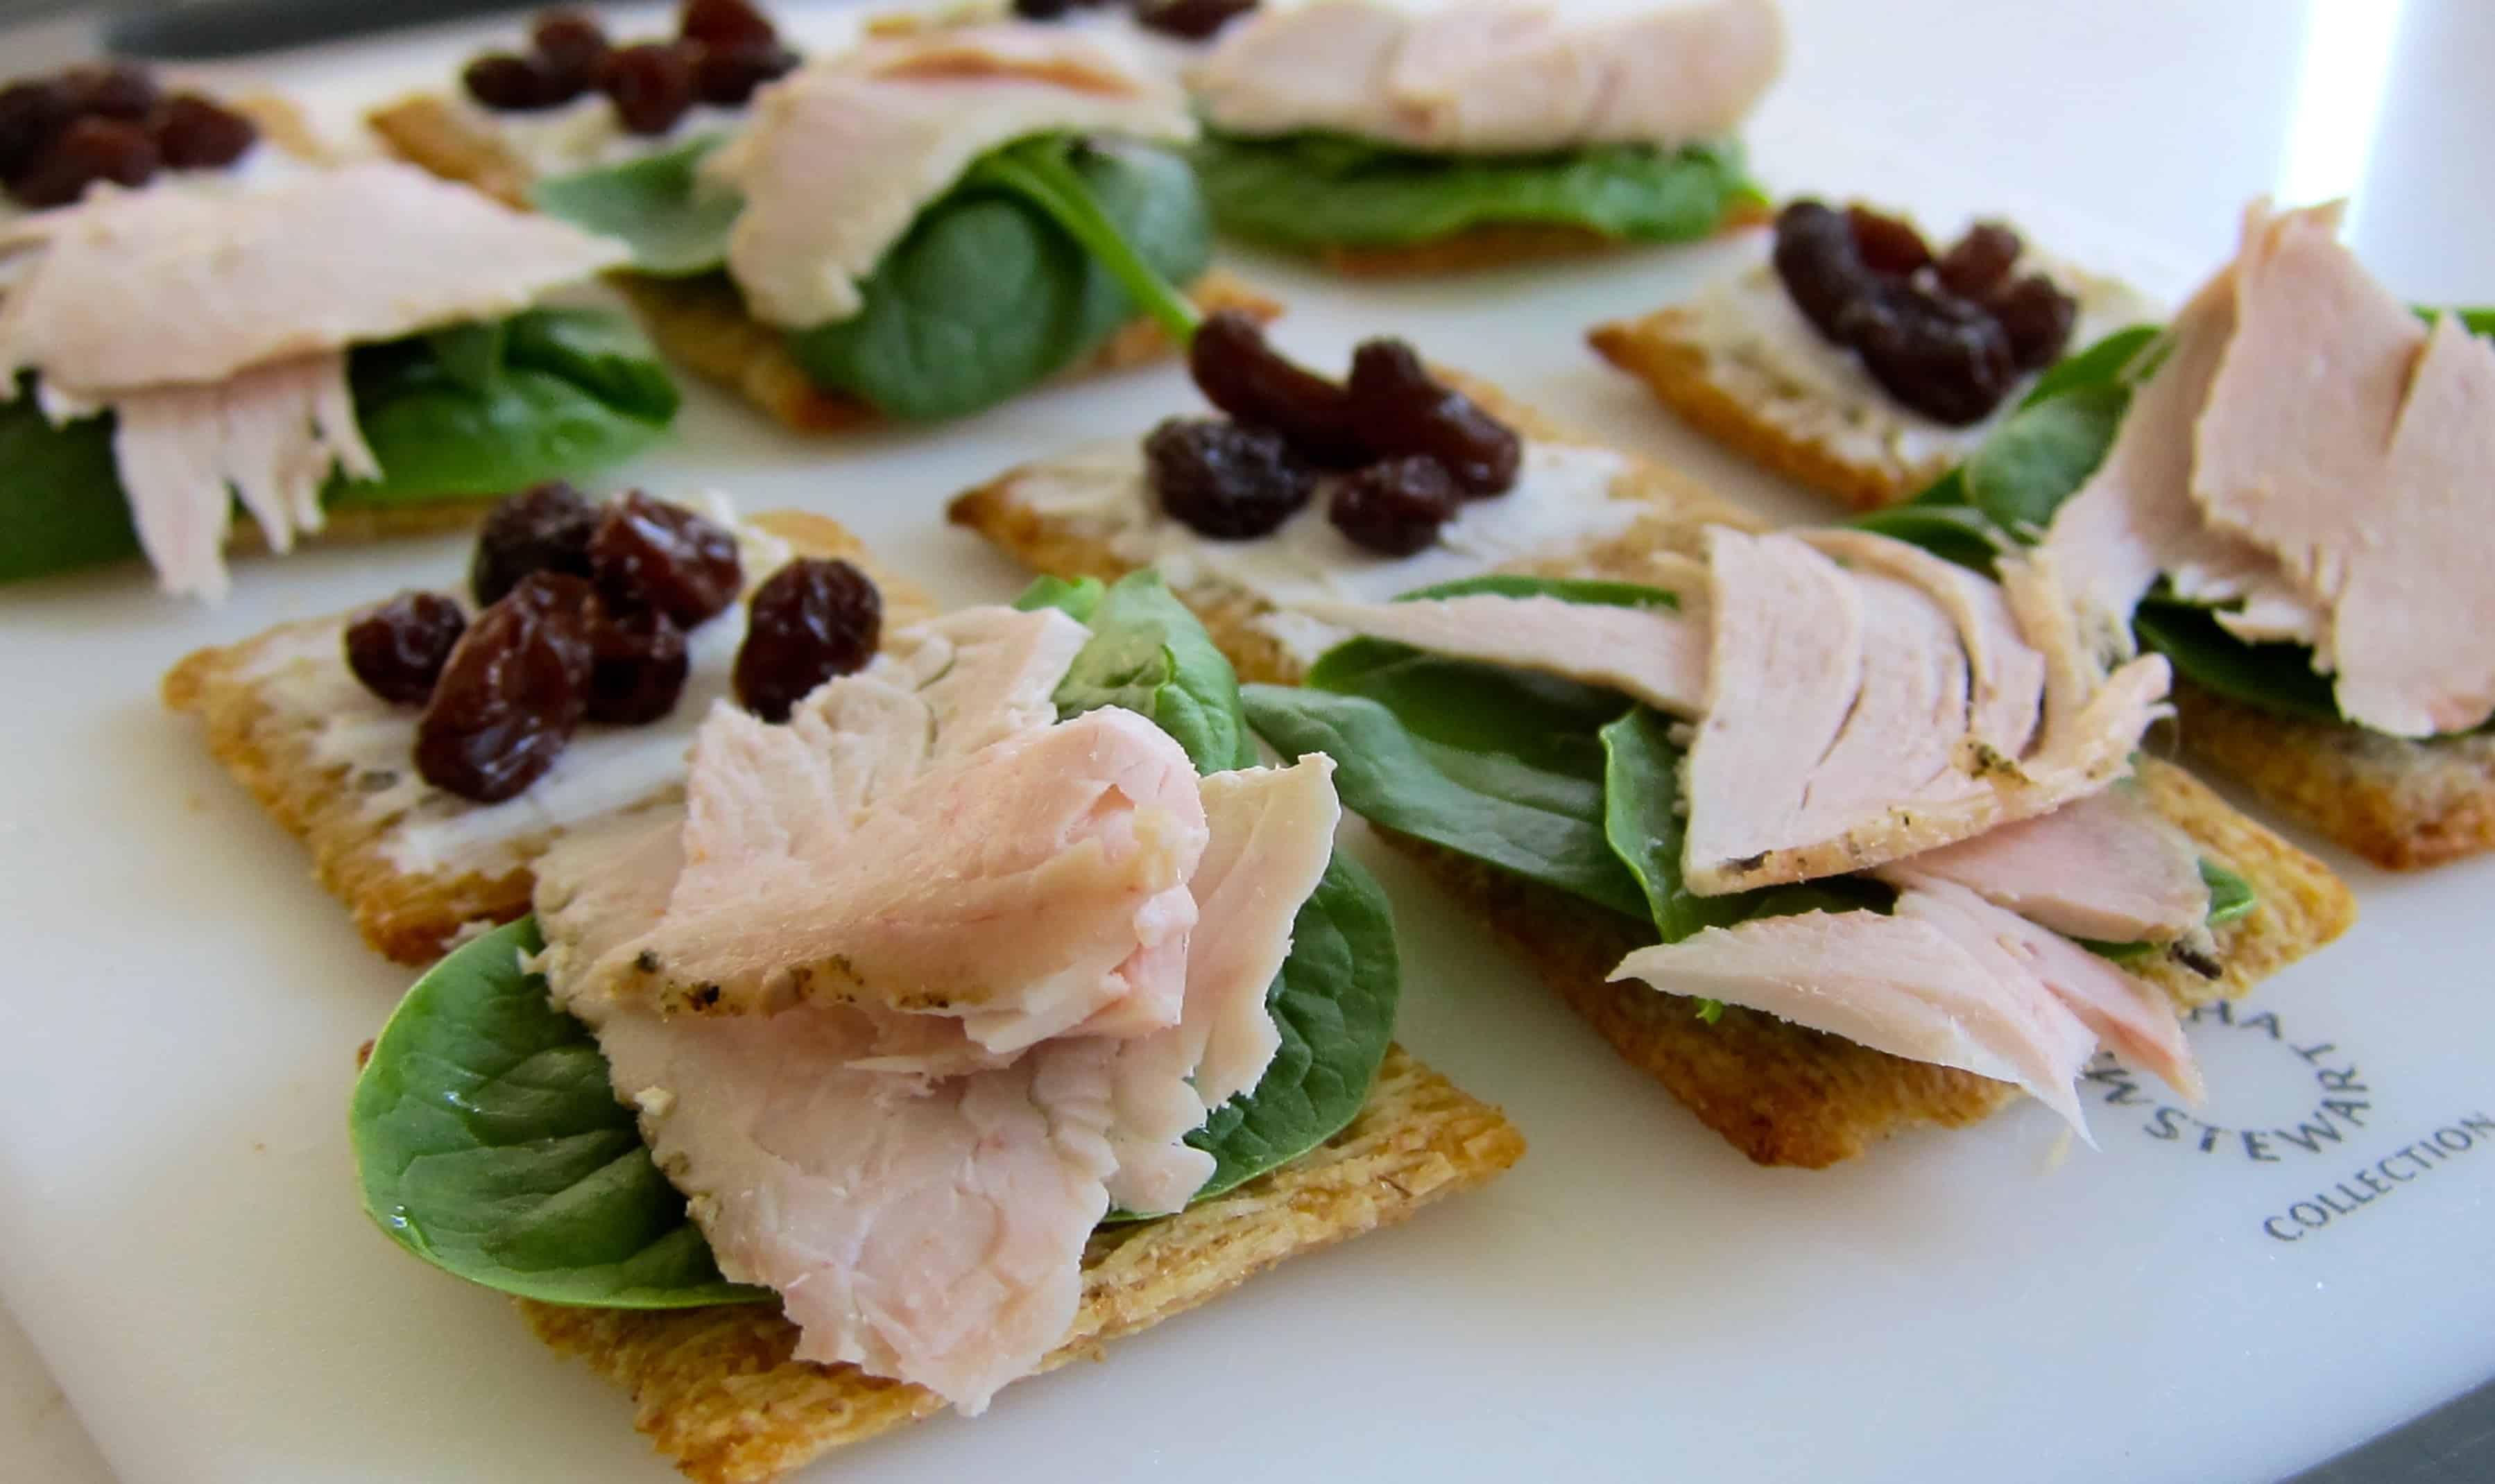 No-Cook Snacks: Whole Wheat Cracker Turkey Sandwiches